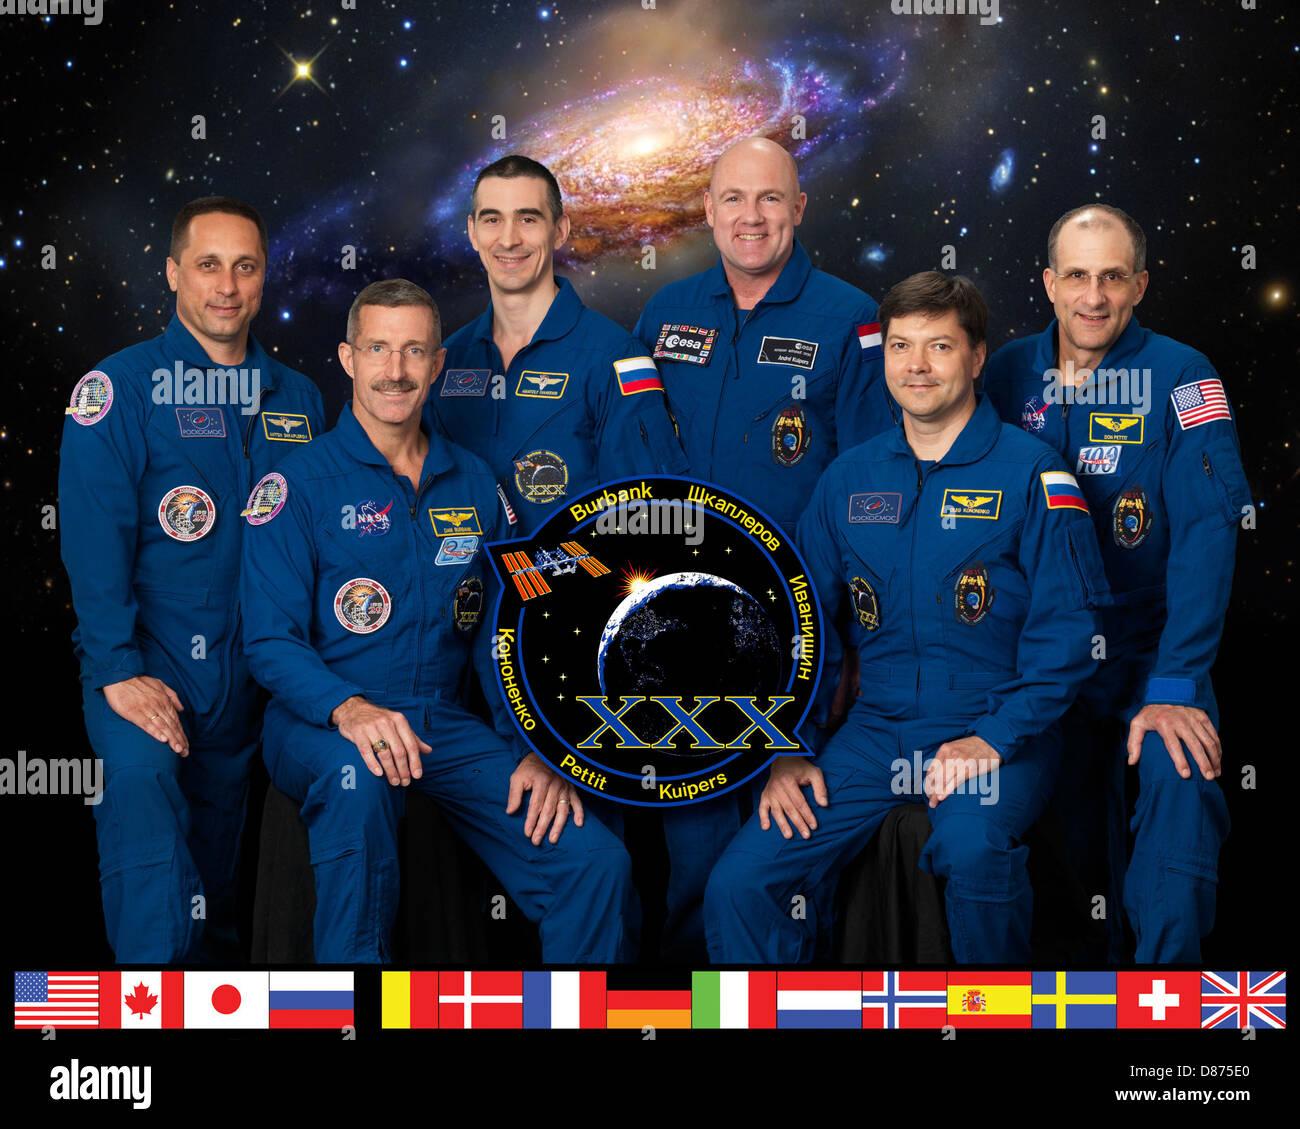 Expedition 30 crew portrait.jpg - Stock Image